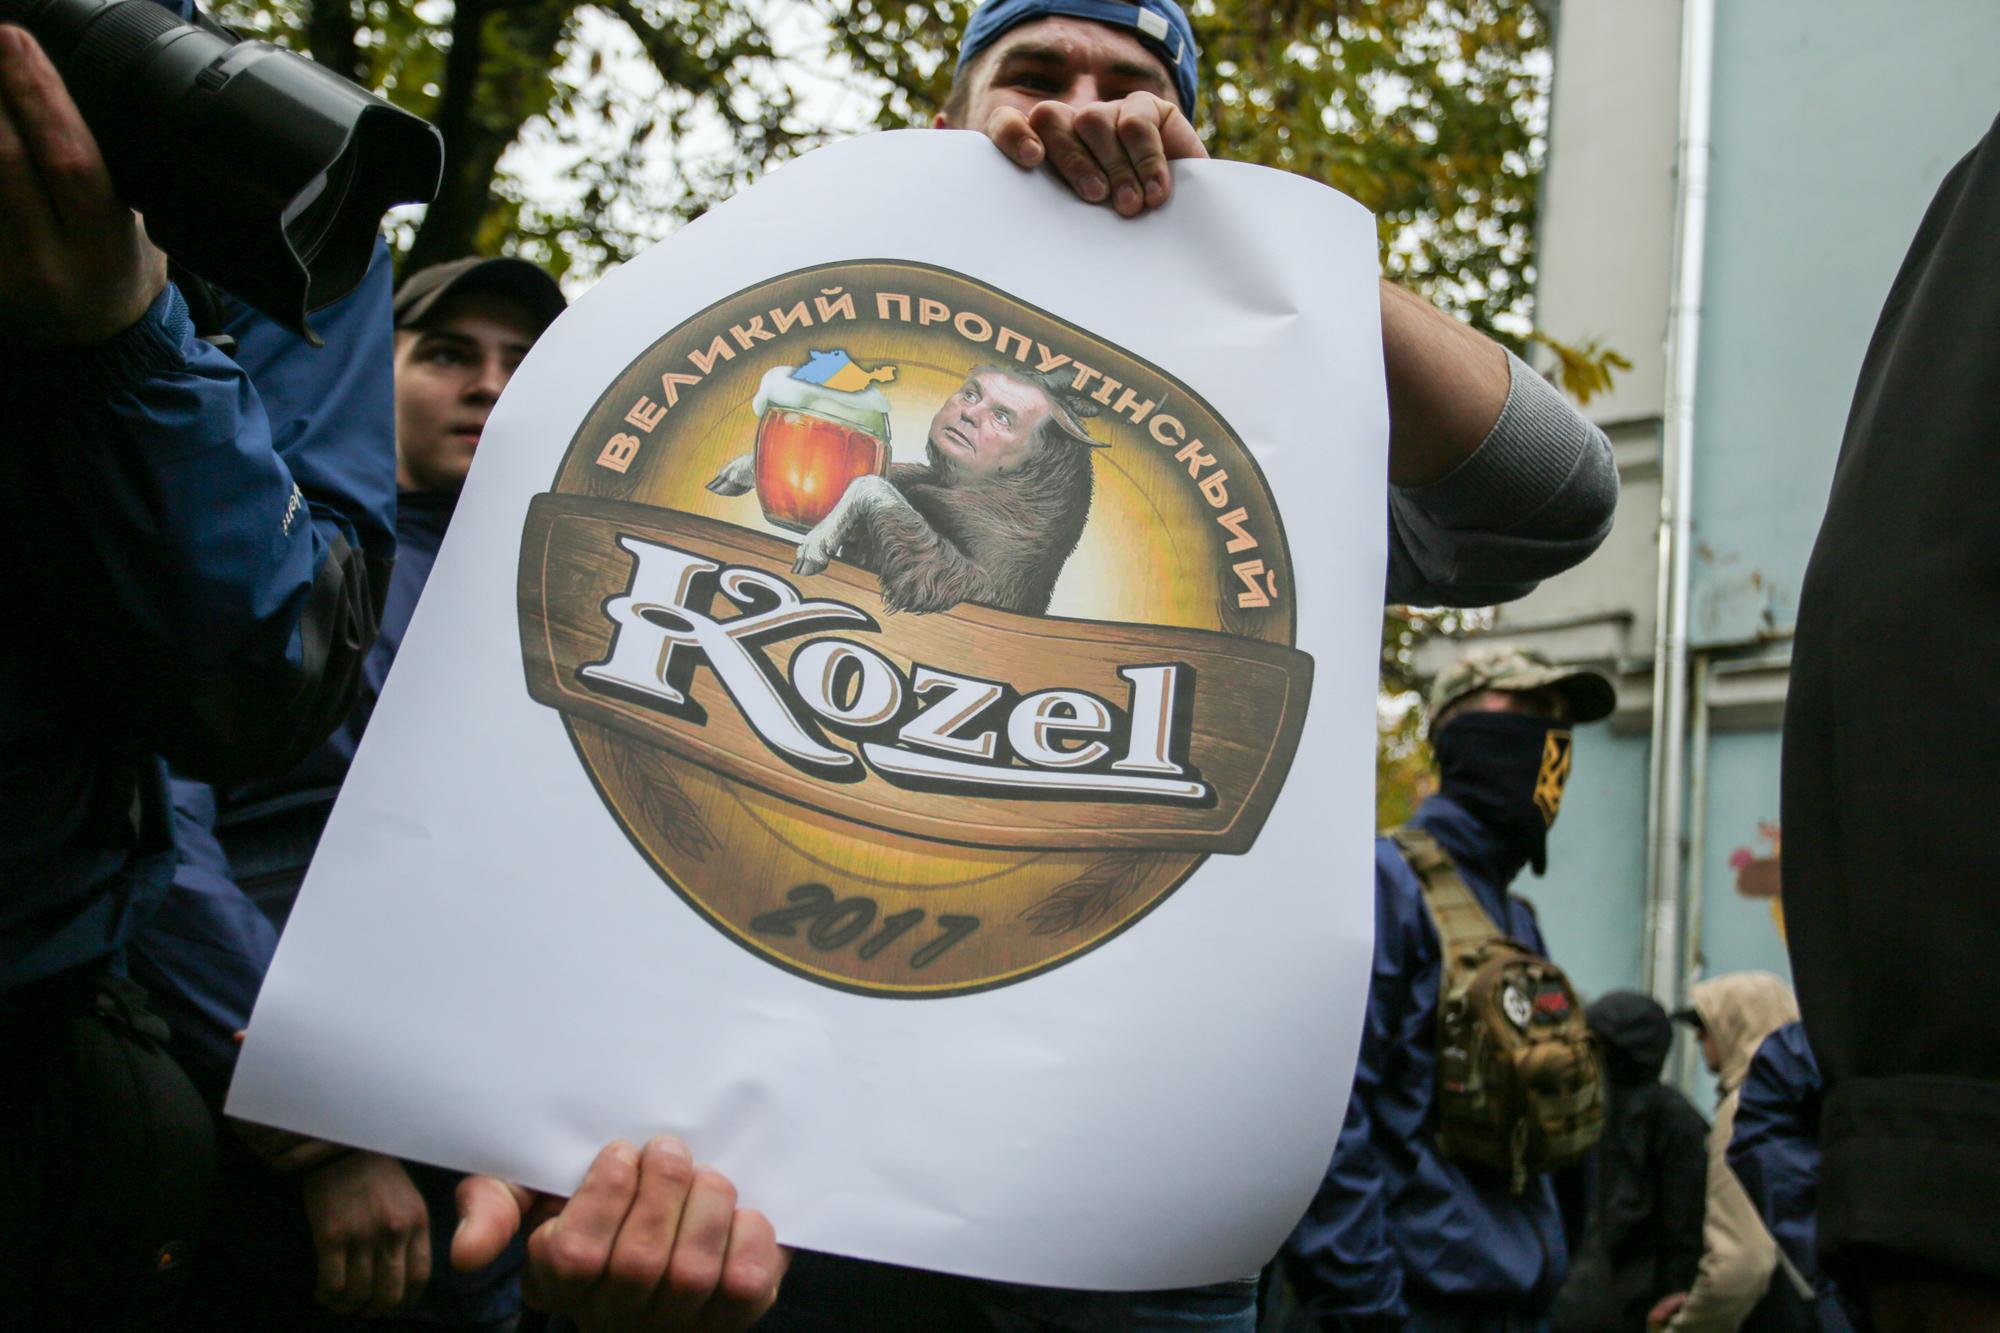 Козёл принял участие вакции протеста украинских националистов